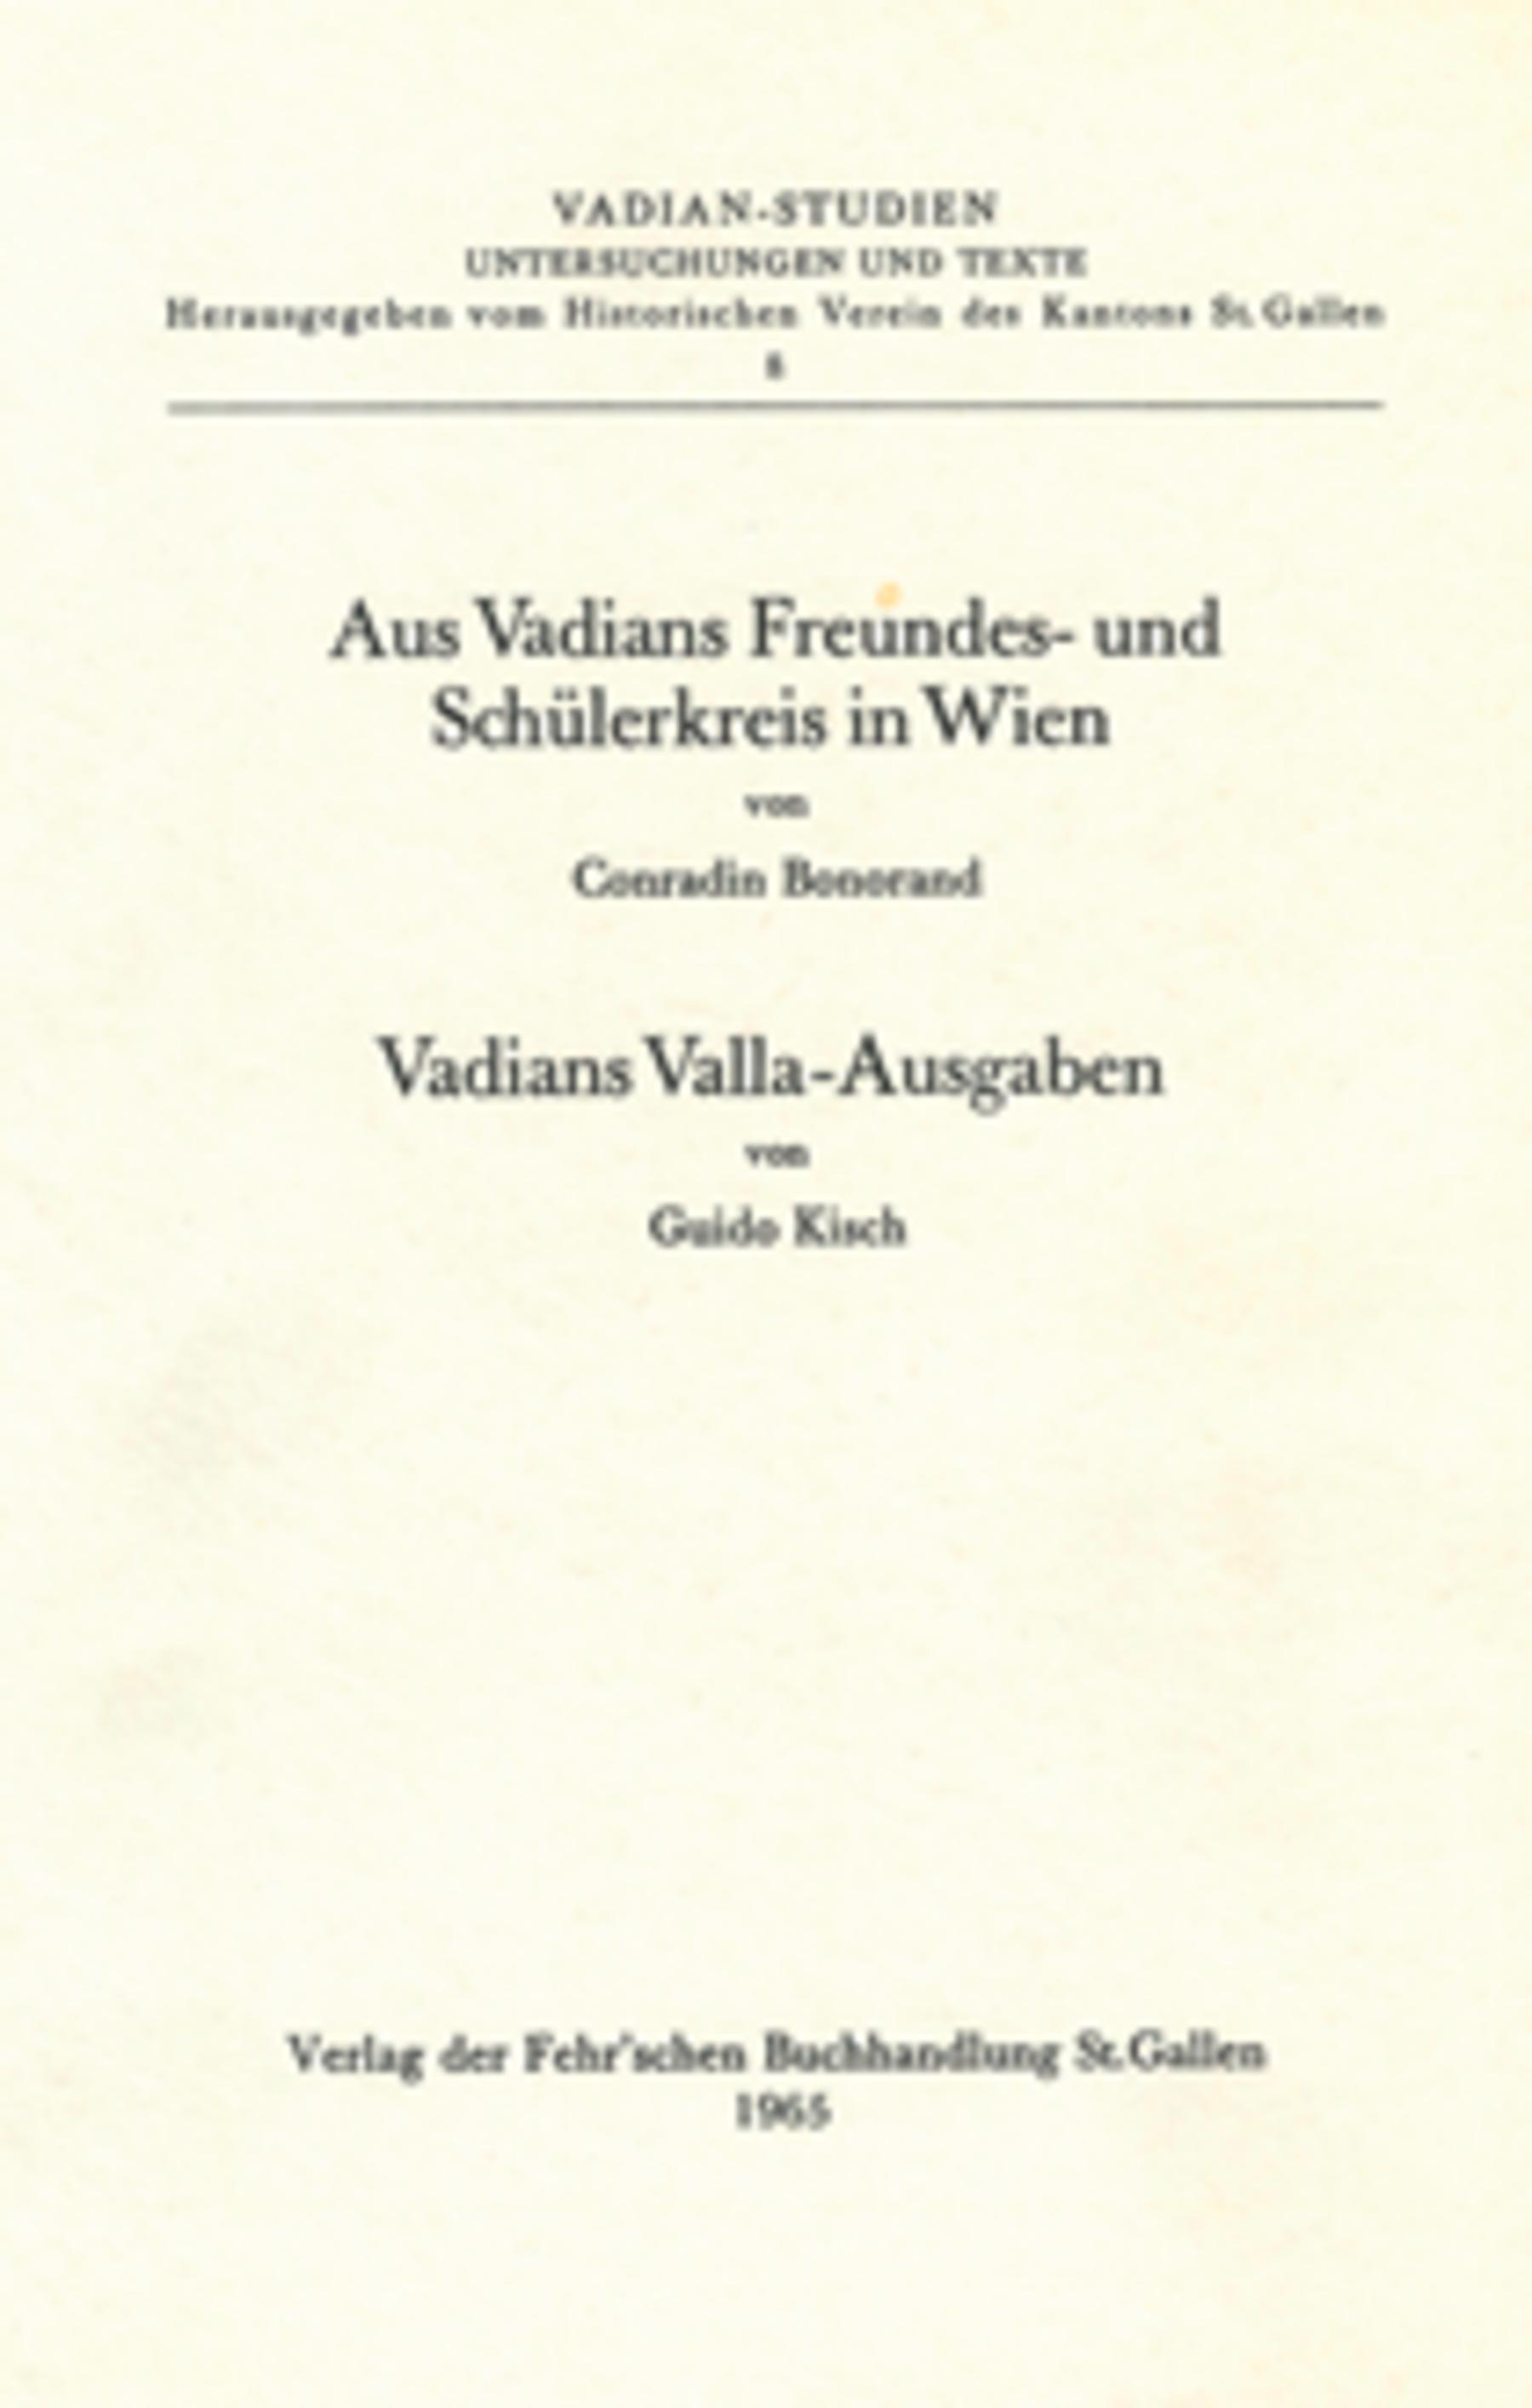 <p><p>Vadians Valla-Ausgaben